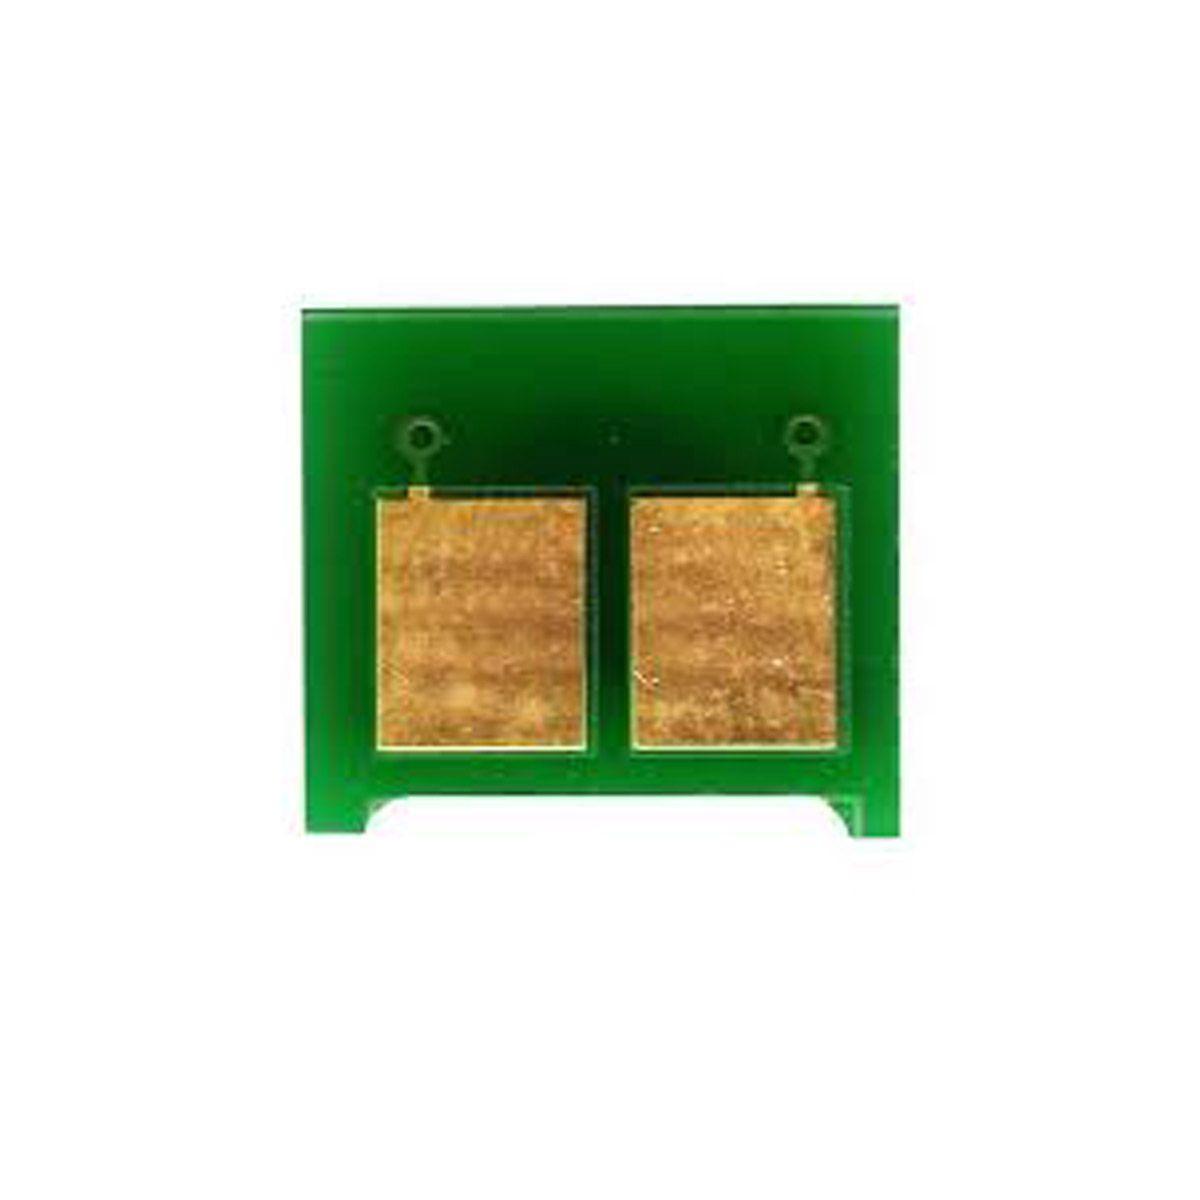 Chip HP CE255A CE255 255A 55A - P3015 P3016 P3015N M525F M521DN - 6k